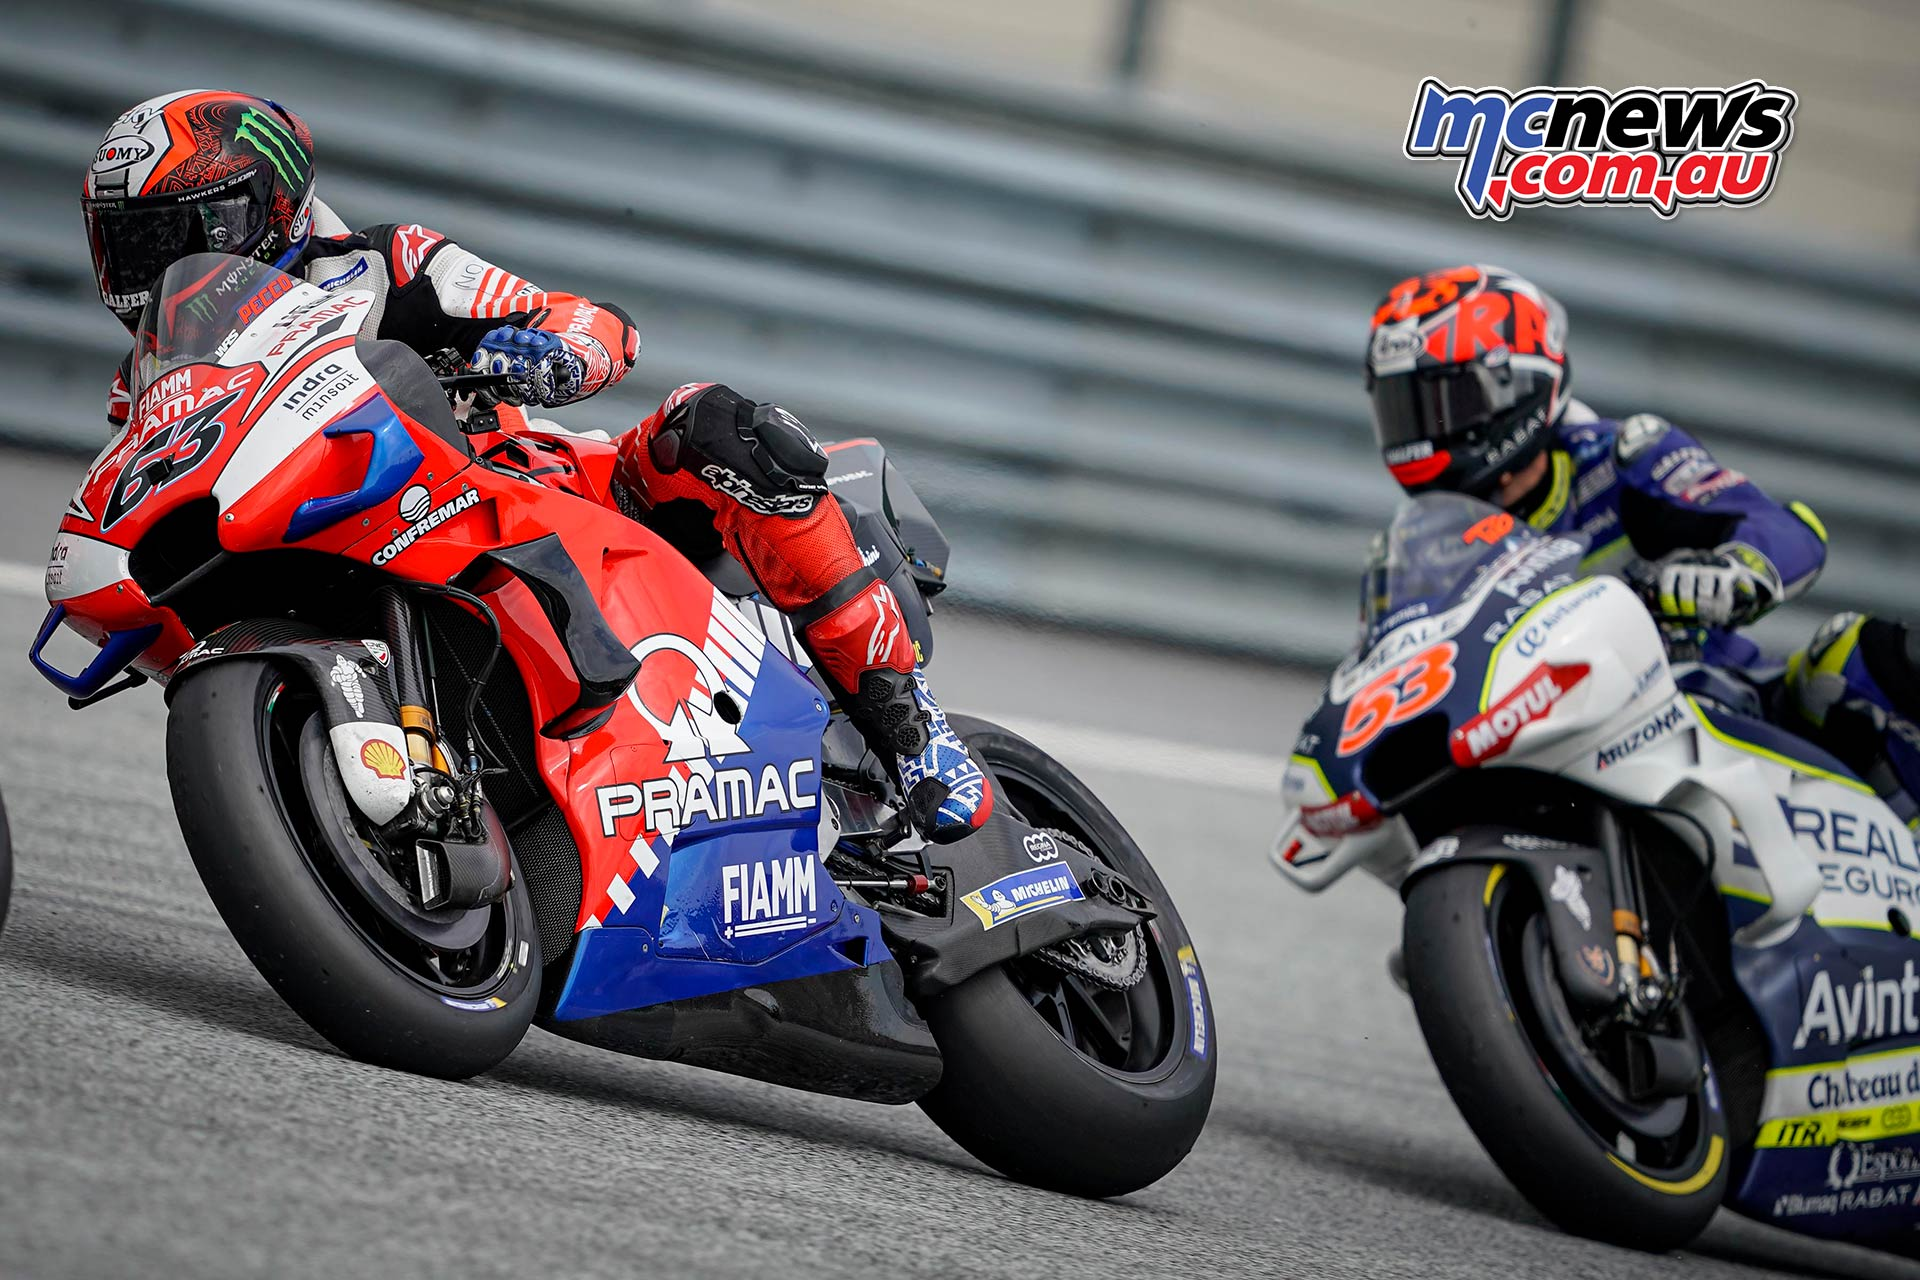 MotoGP Rnd RedBullRing Race Bagnaia Rabat